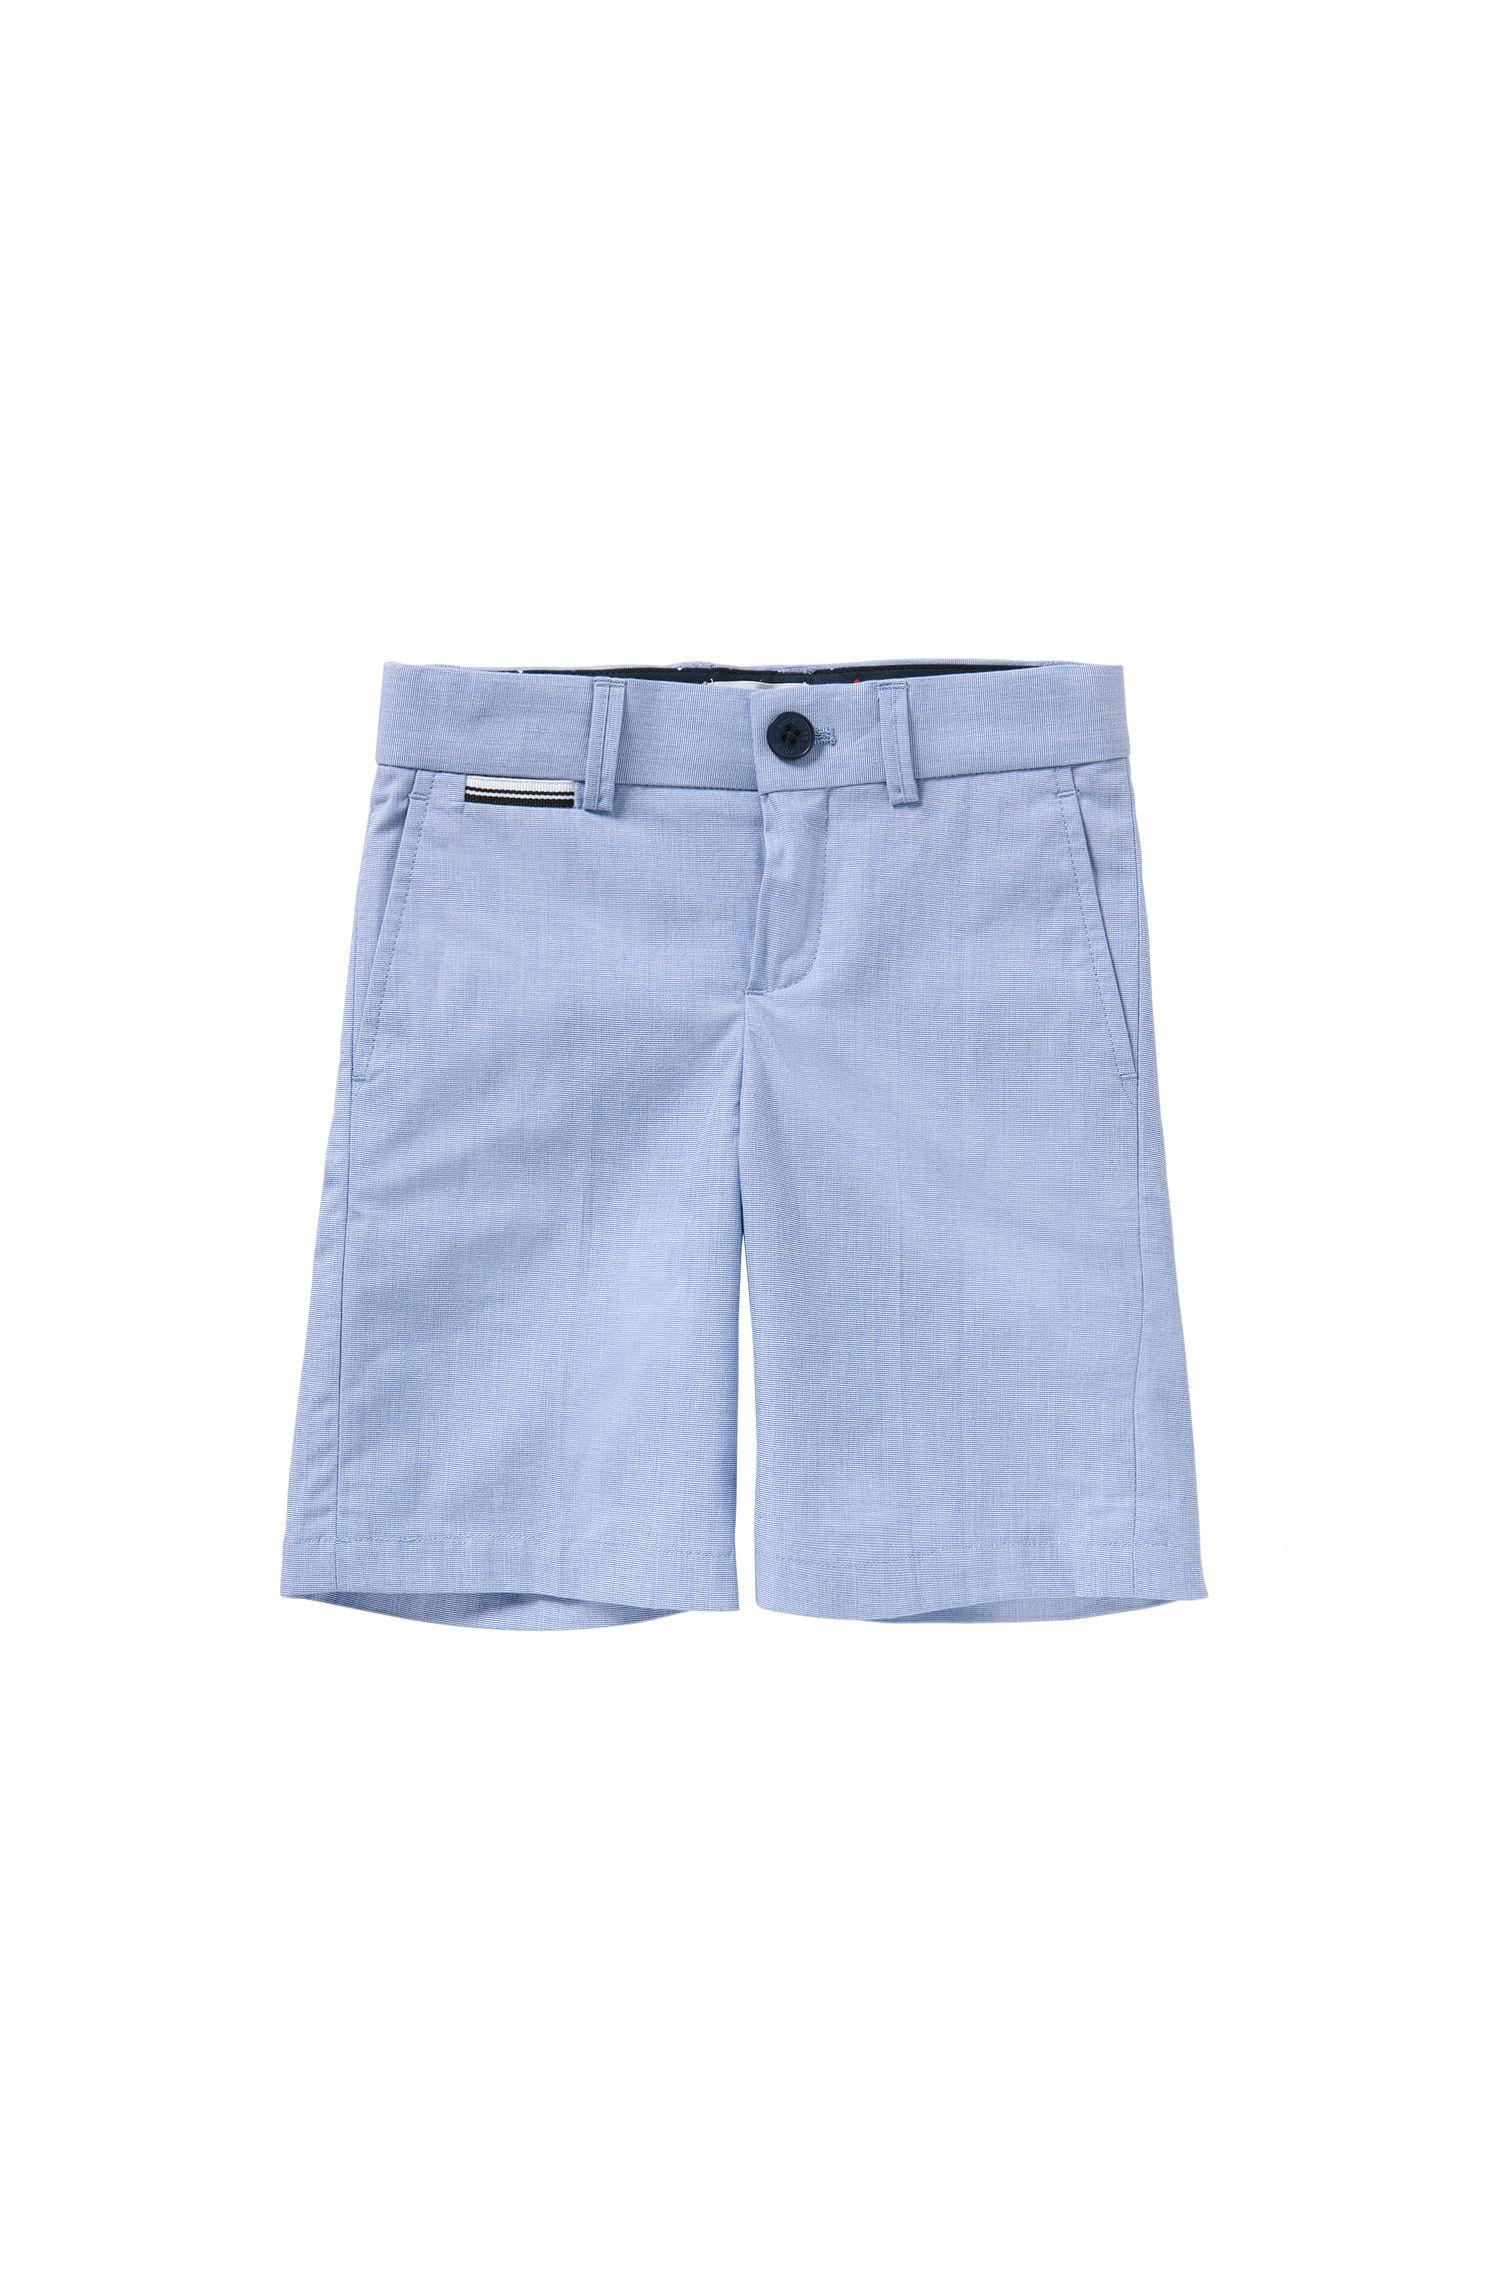 'J24411' | Boys Cotton End-on-End Bermuda Shorts